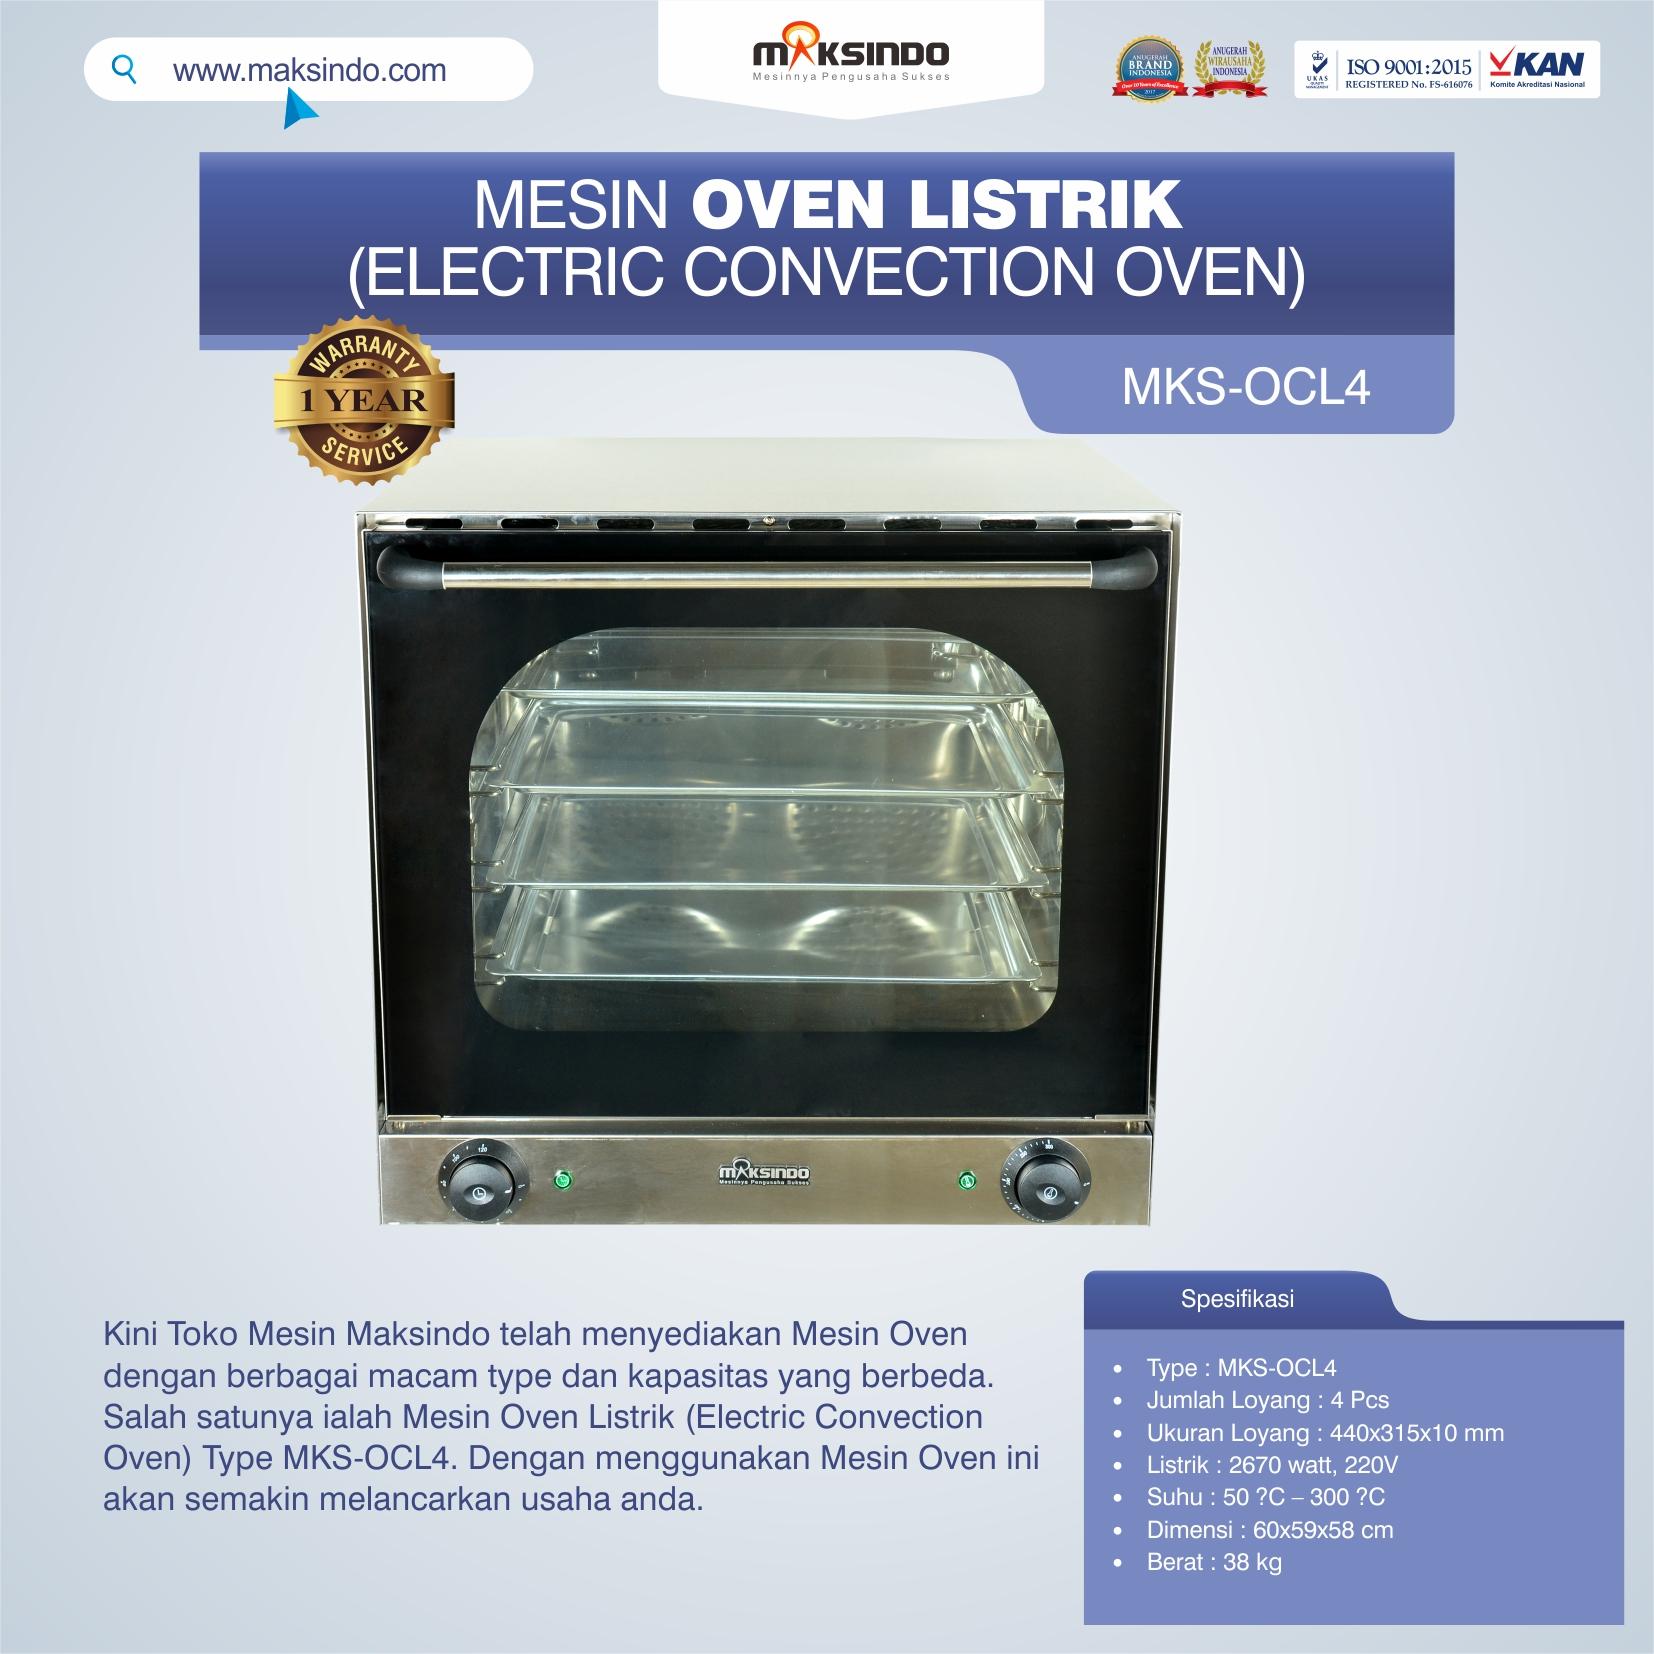 Jual Mesin Oven Listrik (Electric Convection Oven) MKS-OCL4 di Tangerang